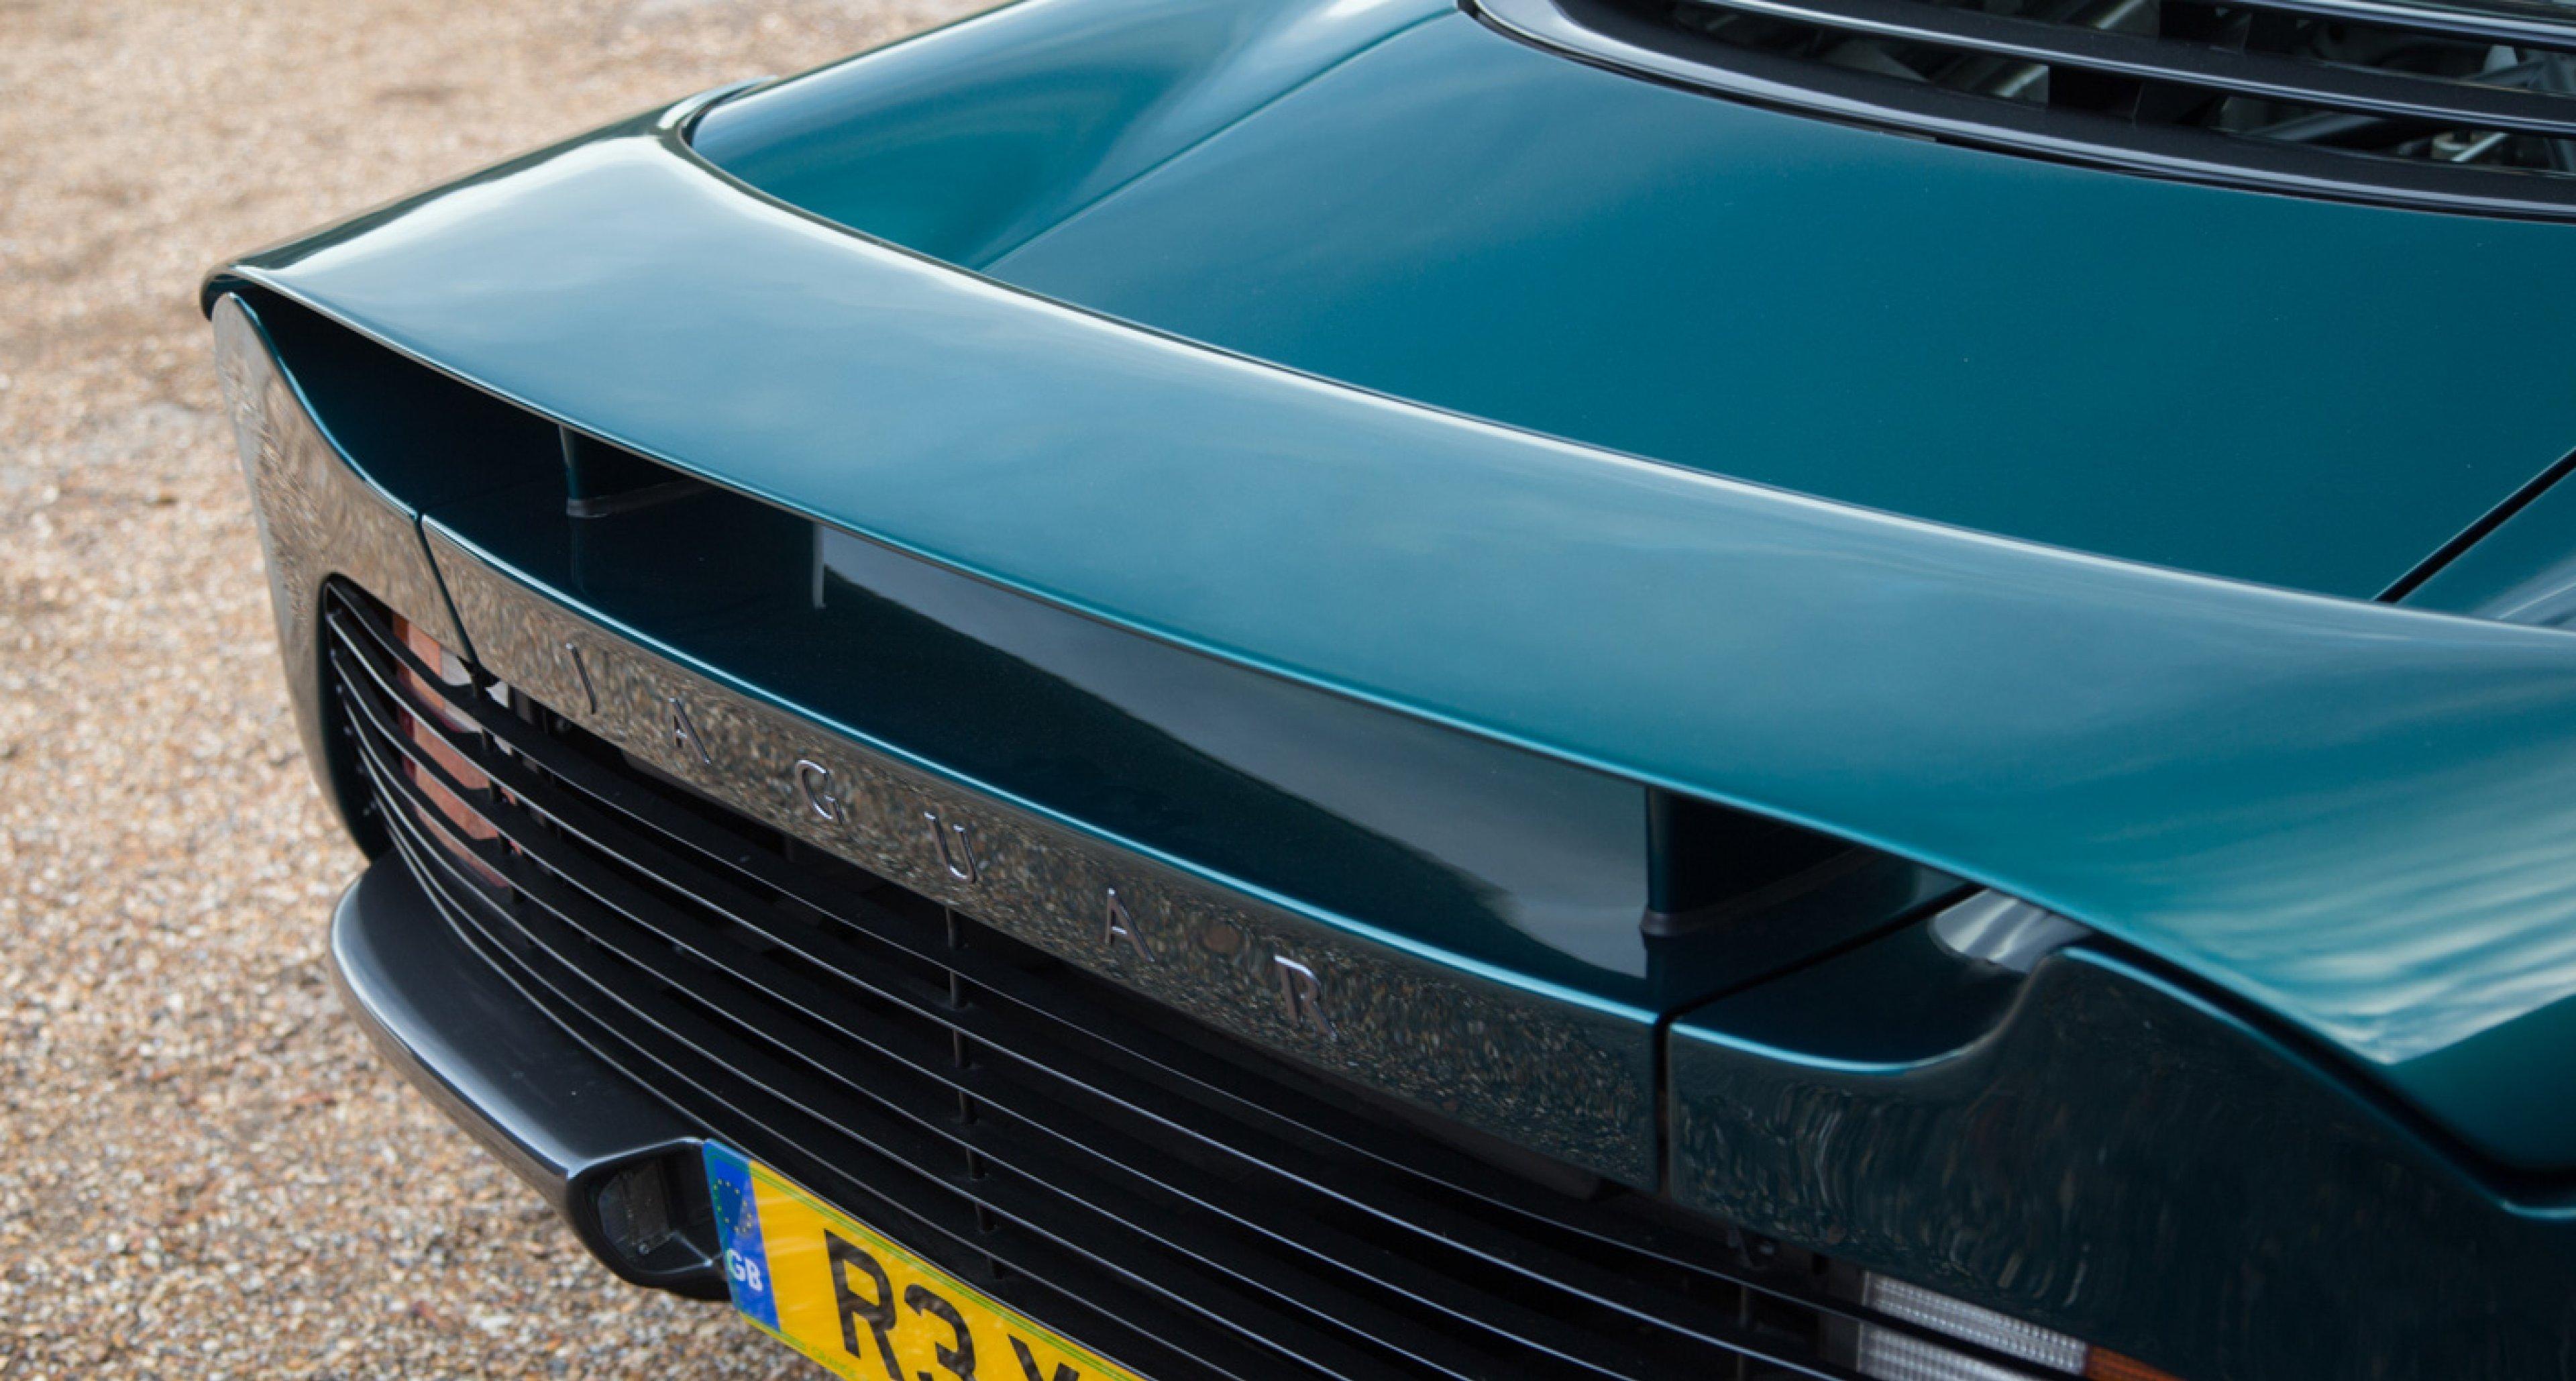 Jaguar XJ220 wing